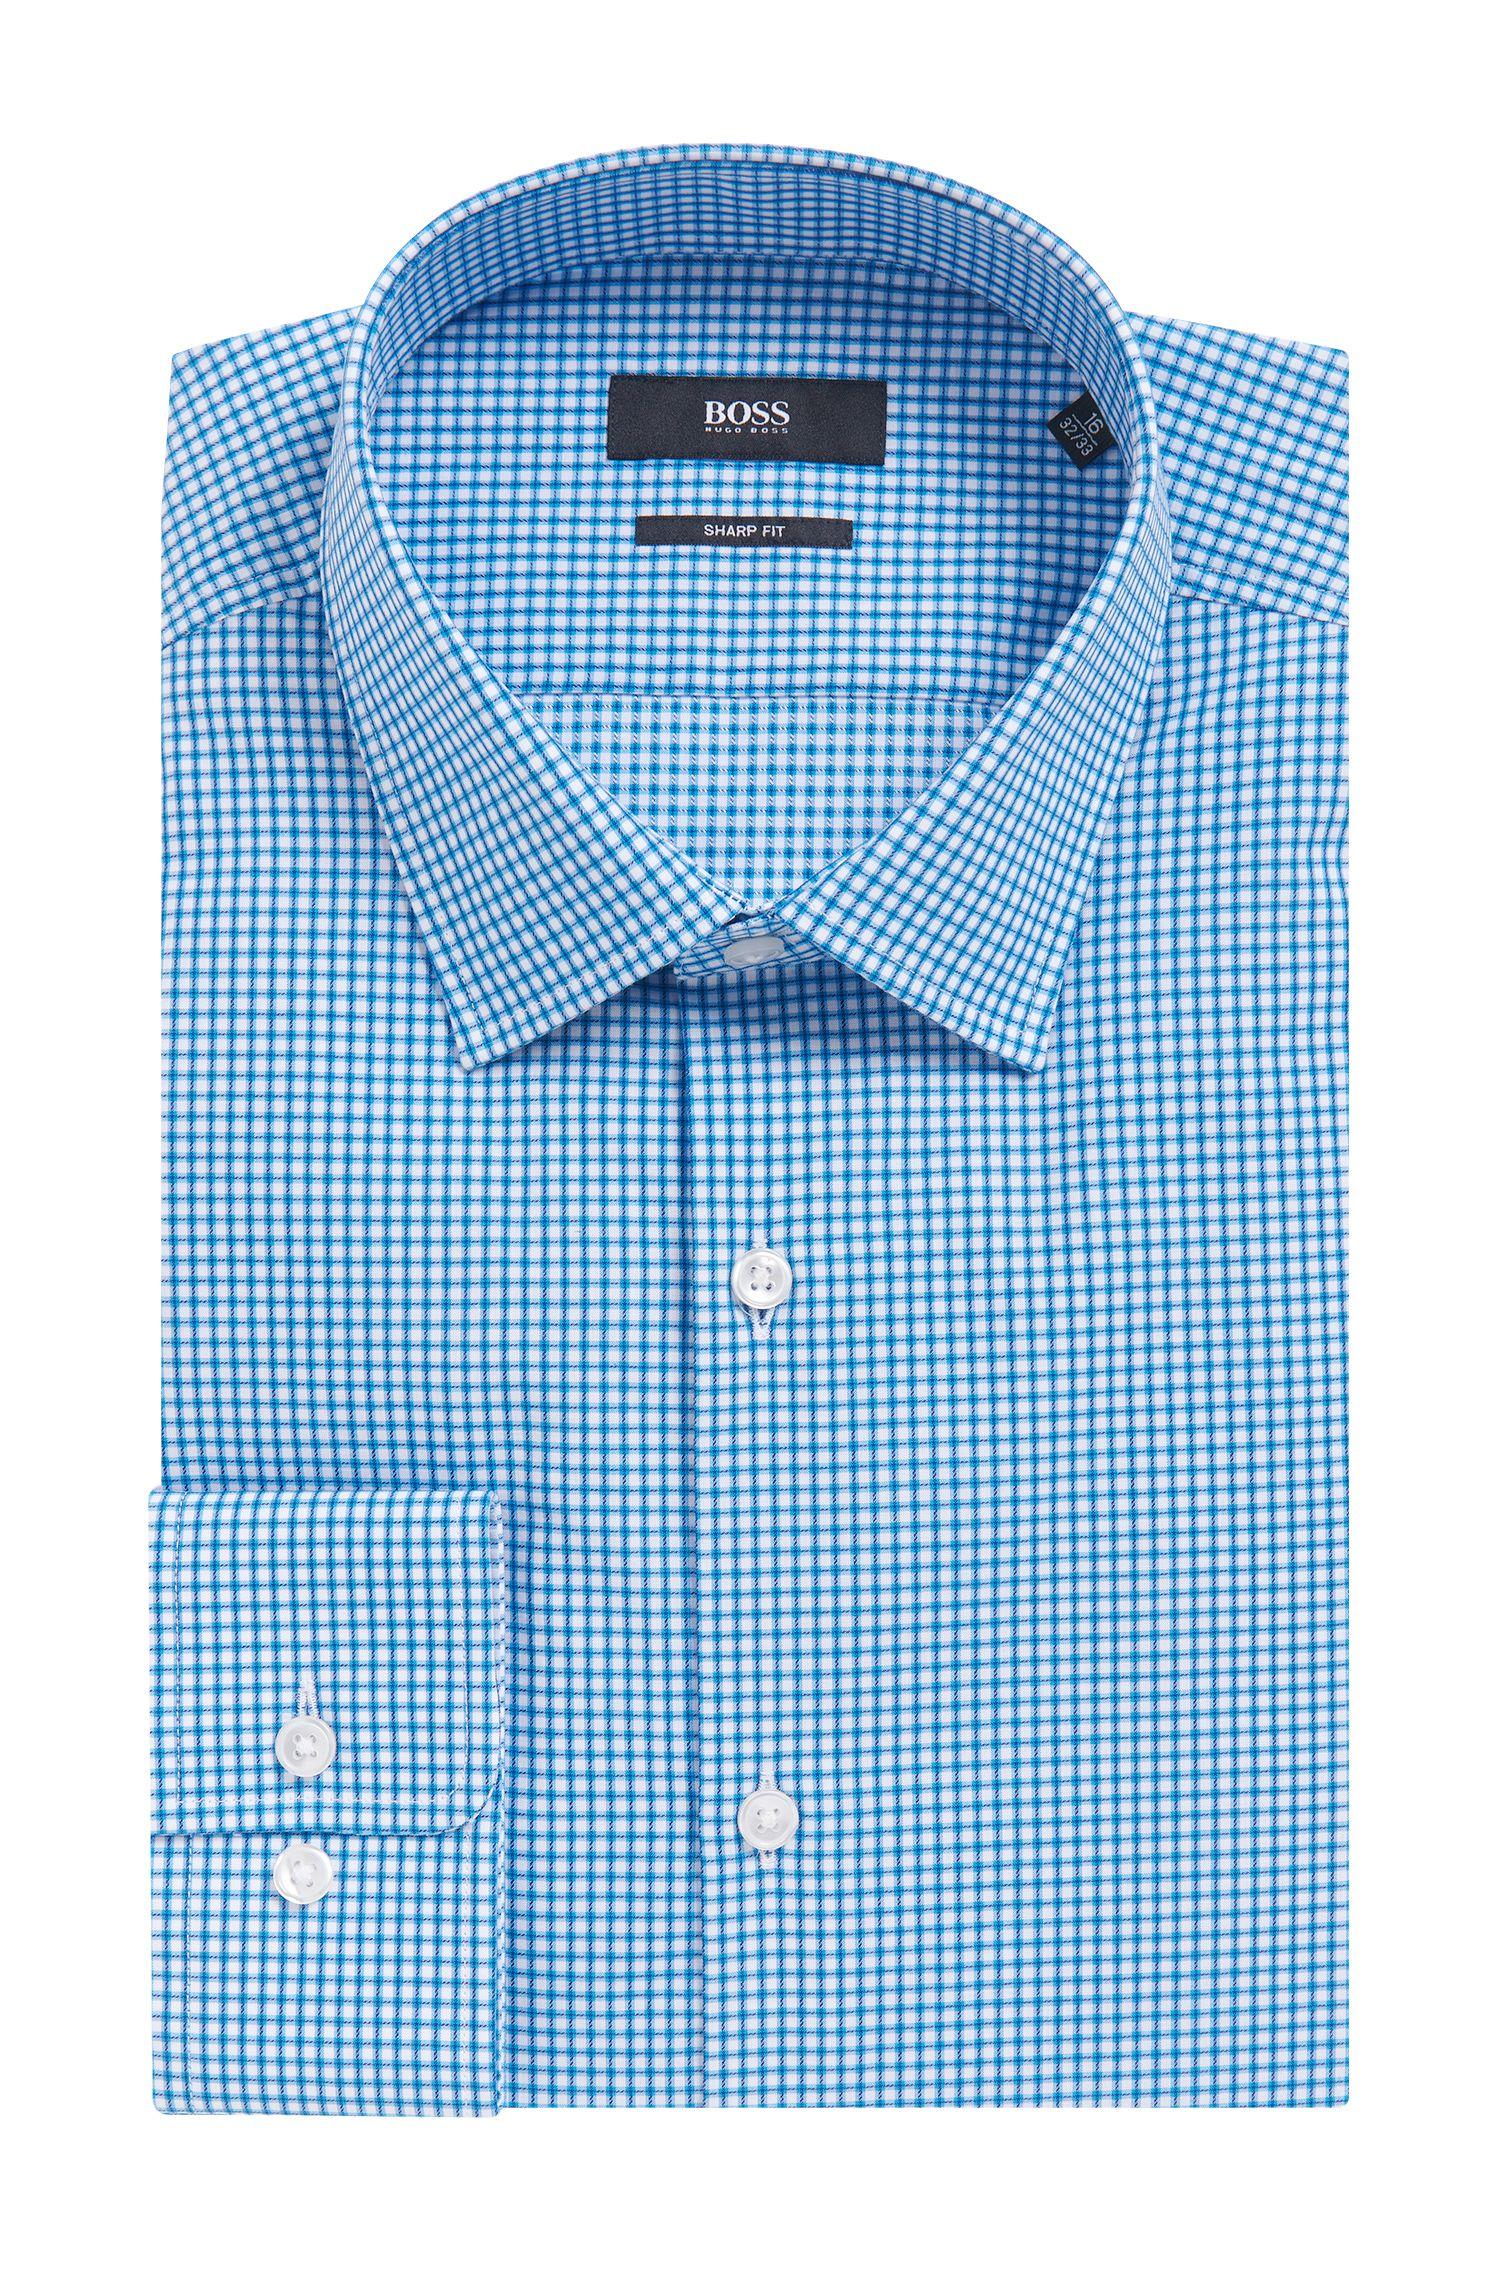 Checked Cotton Dress Shirt, Sharp Fit | Marley US